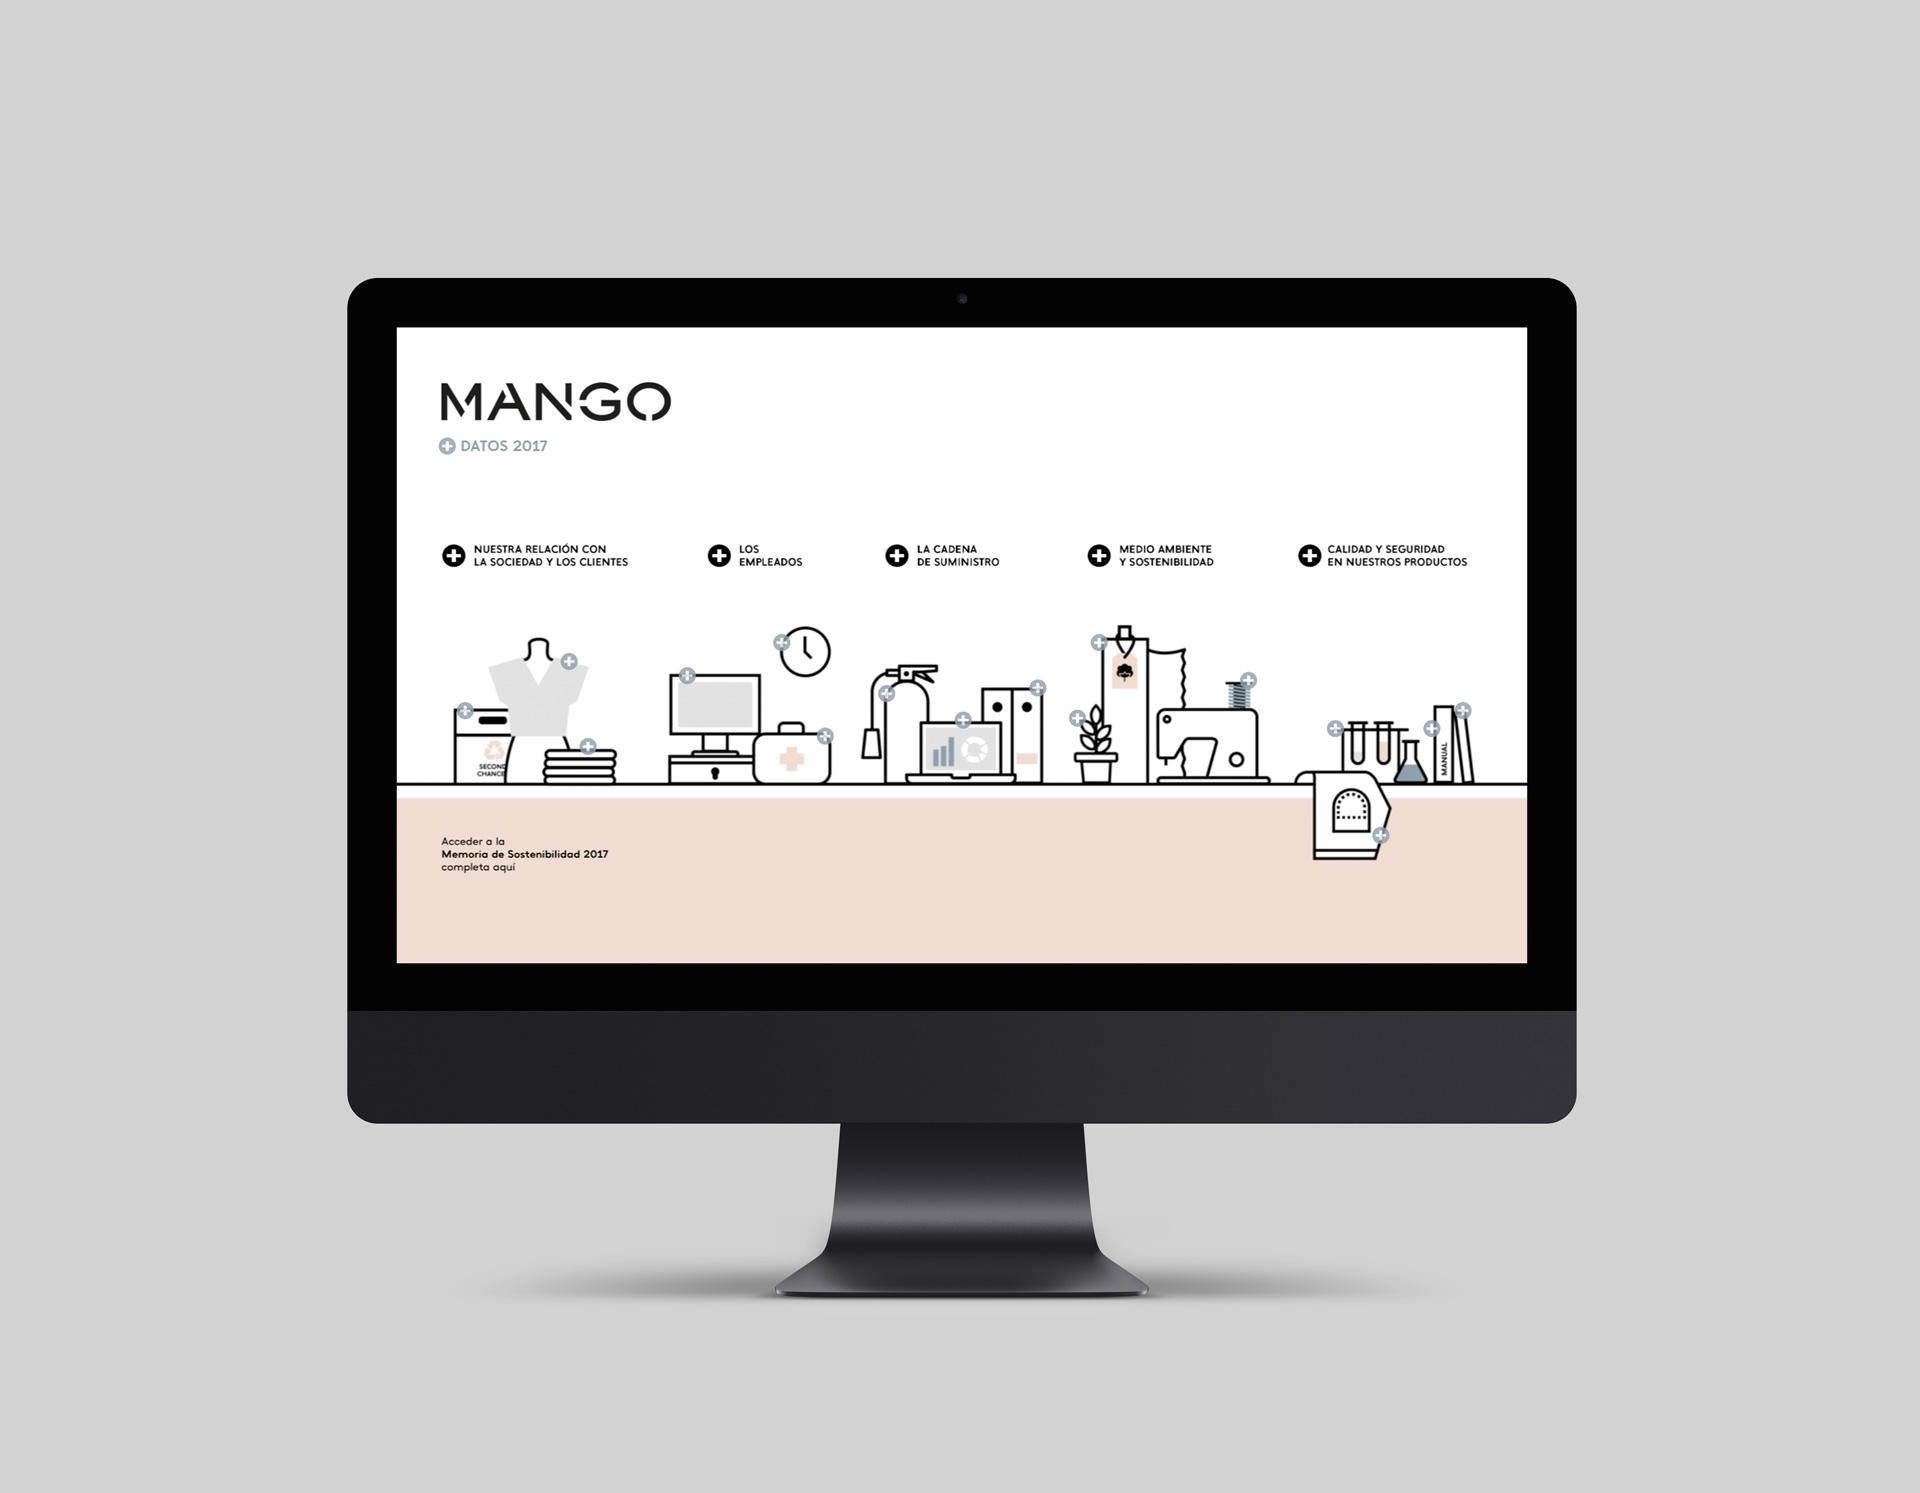 mango_post_6